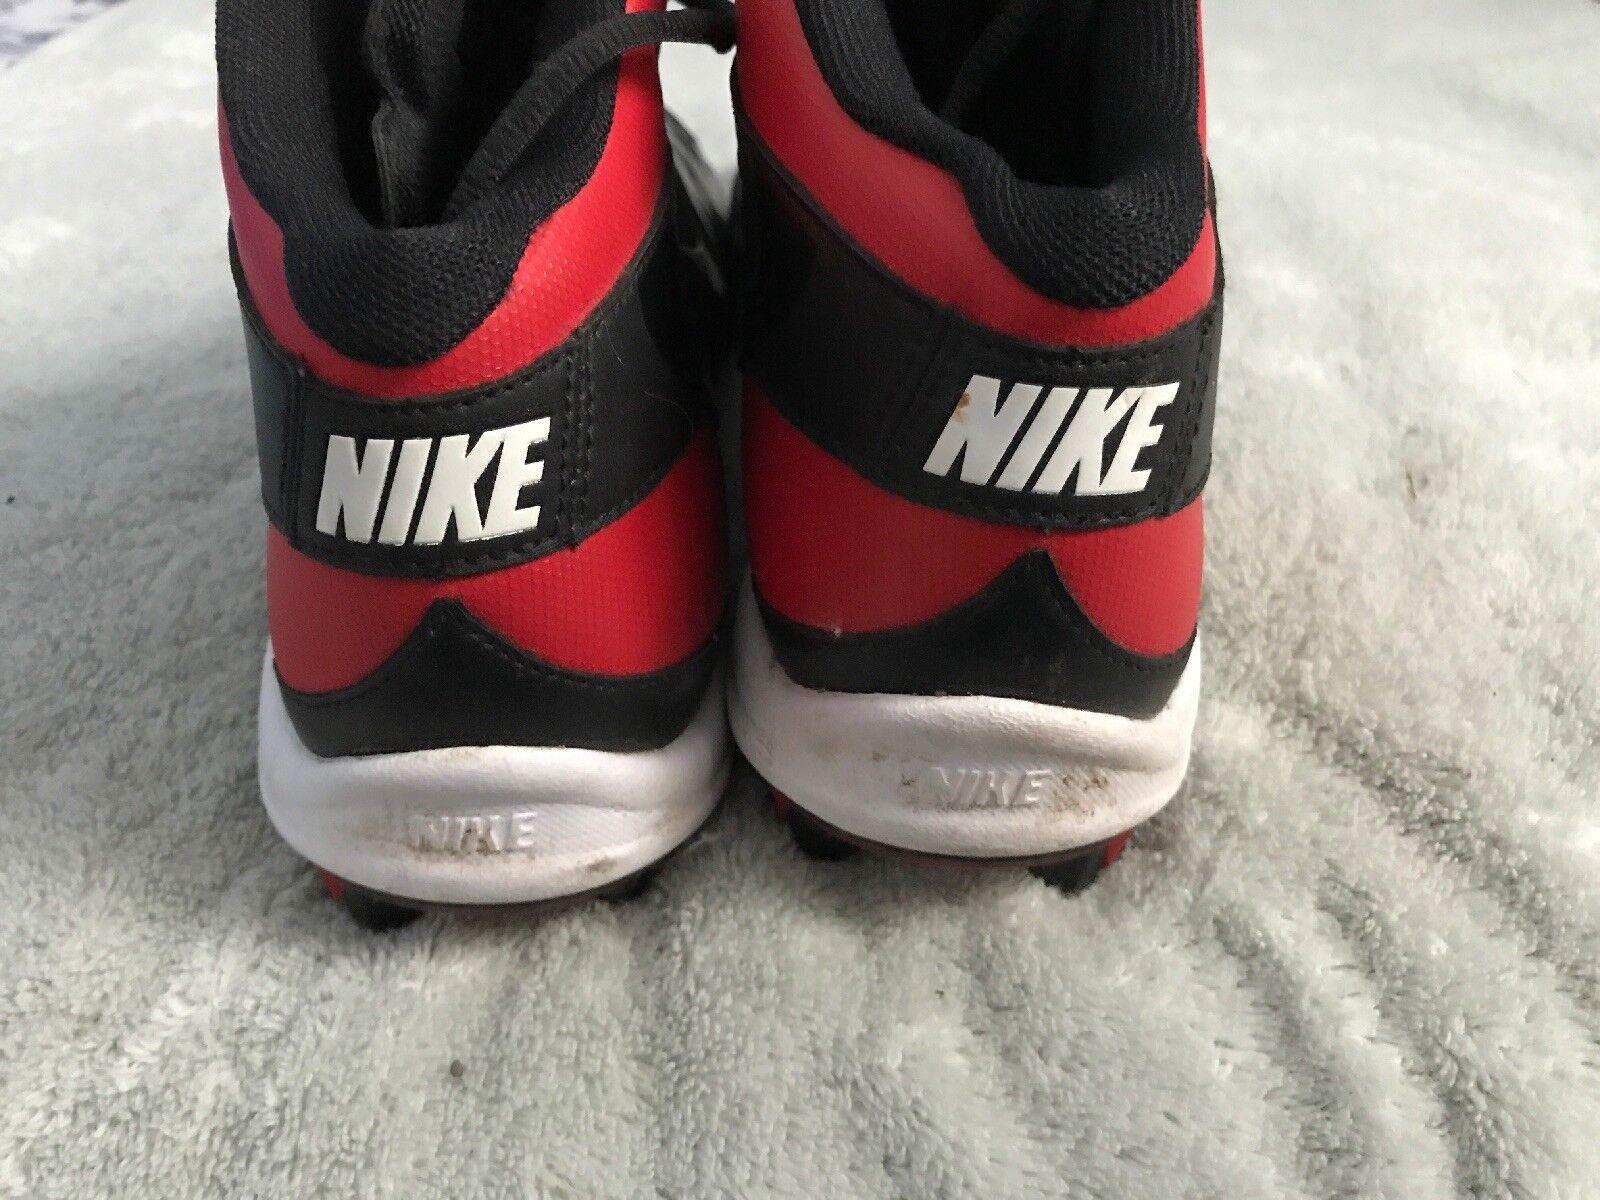 sale retailer 6ba18 57e66 ... Nike Mens Black Red Alpha Shark Shark Shark 2 Mid Football Cleats 11.5  Medium ...